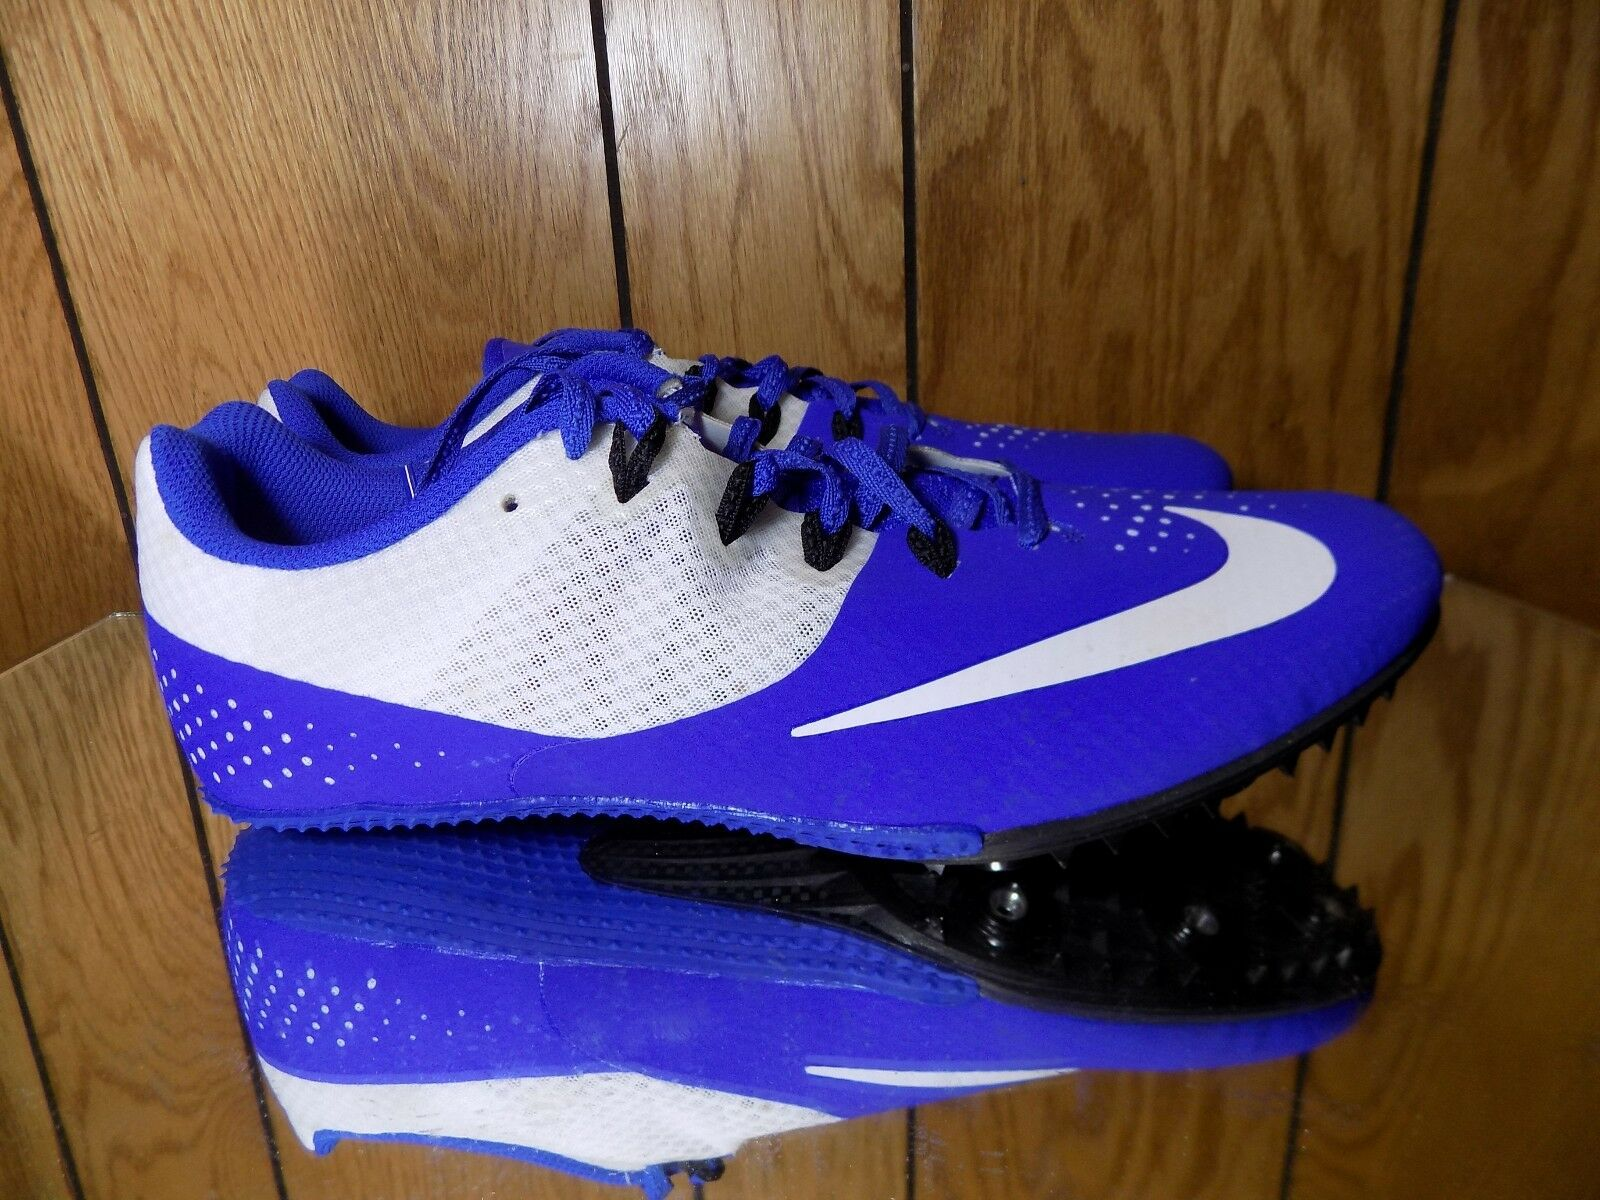 Nike Zoom Rival S 8 Sprint Run Track Cleats 806554-400 Sz 10.5